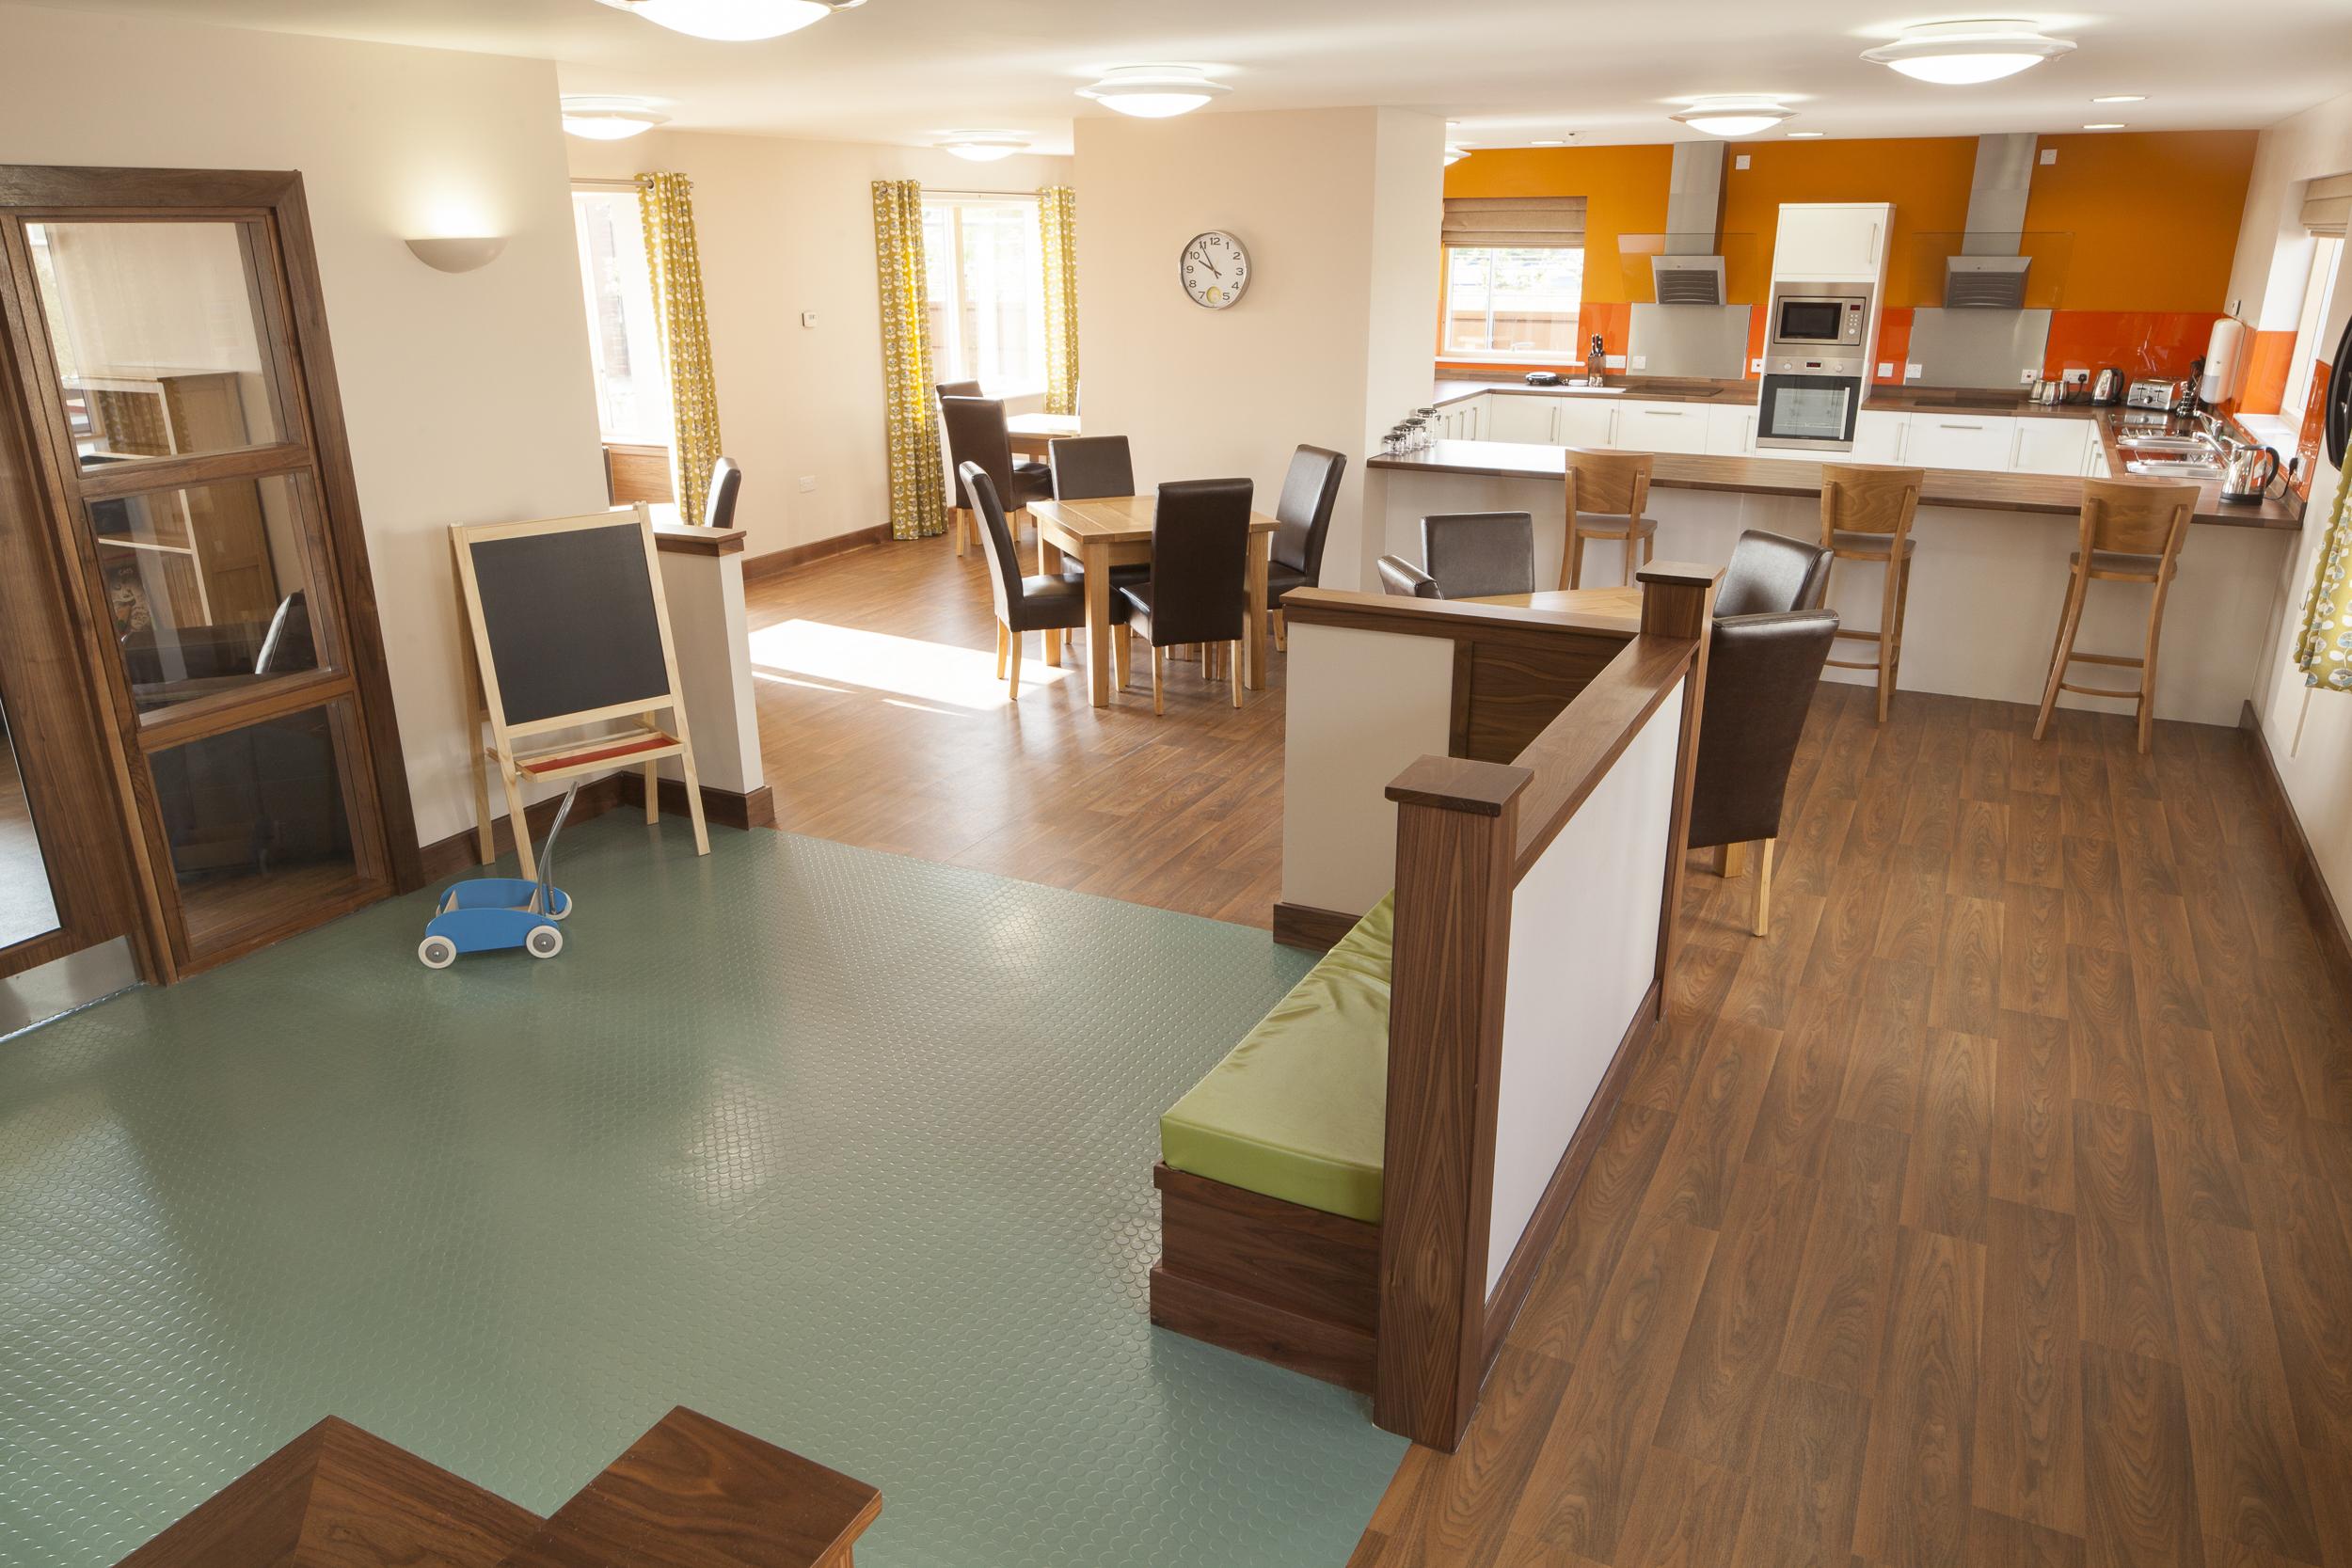 House Facilities